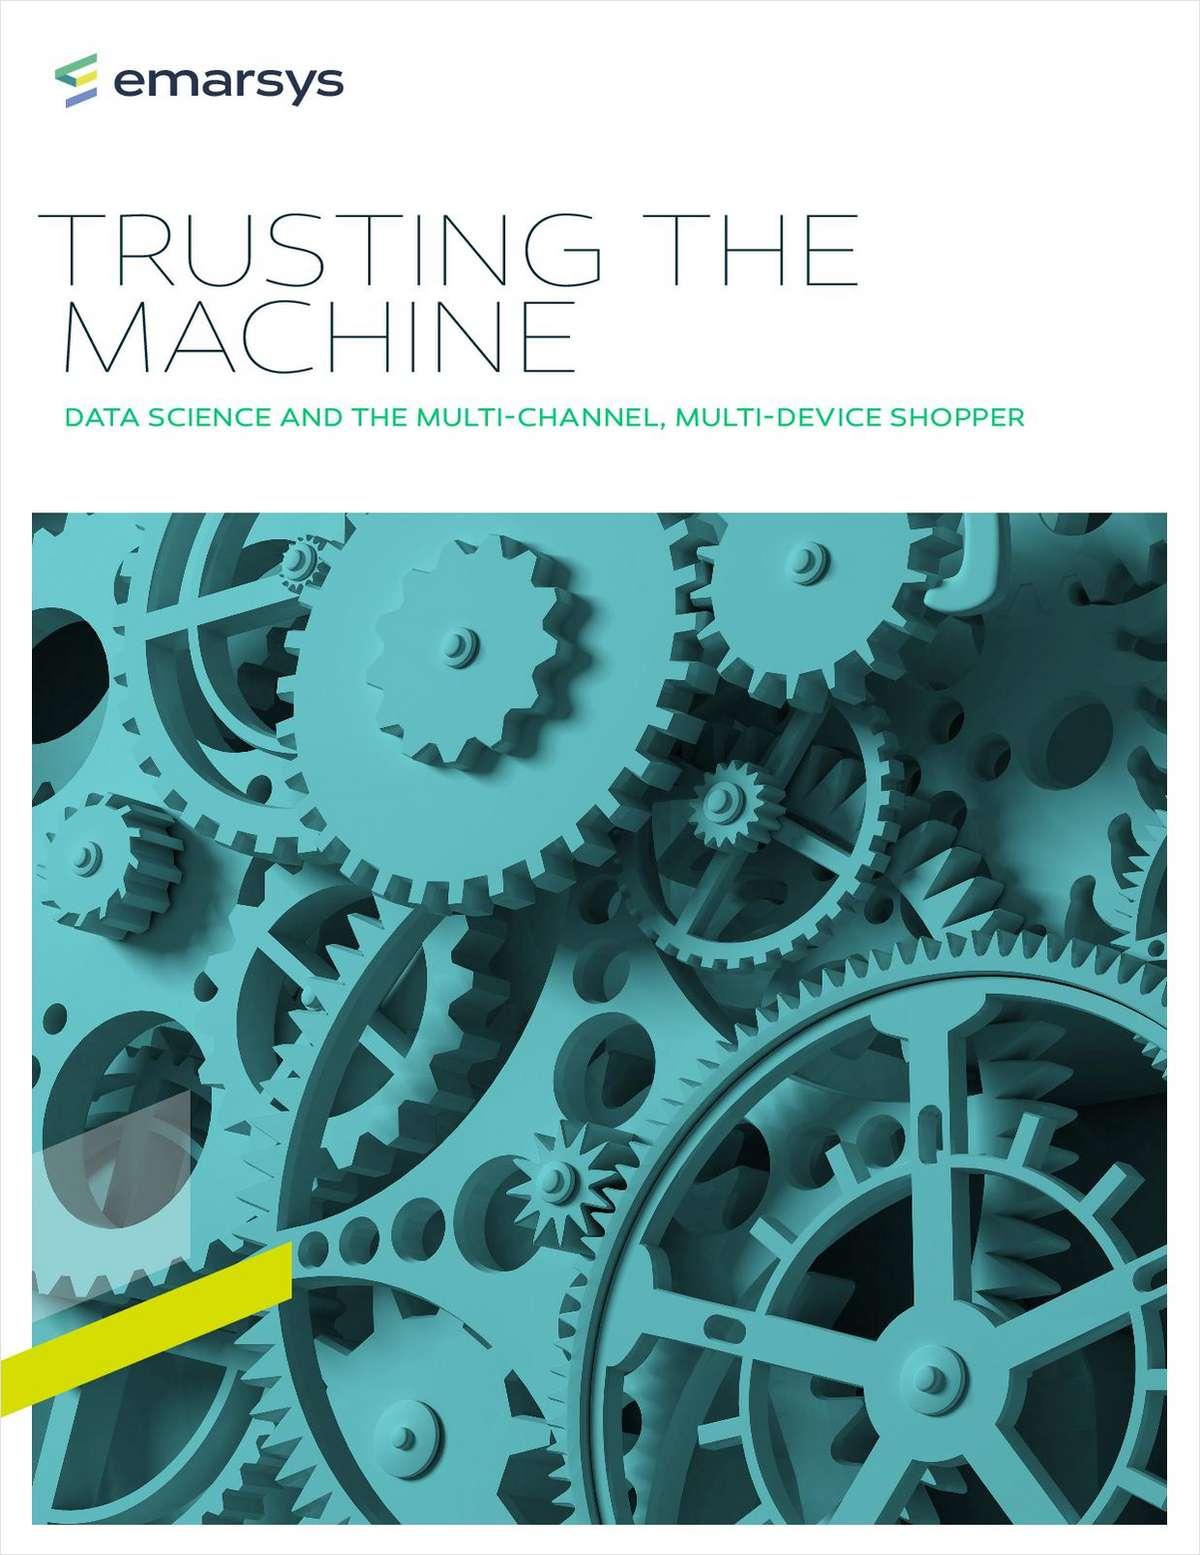 Data Science and the Multi-Channel, Multi-Device Shopper